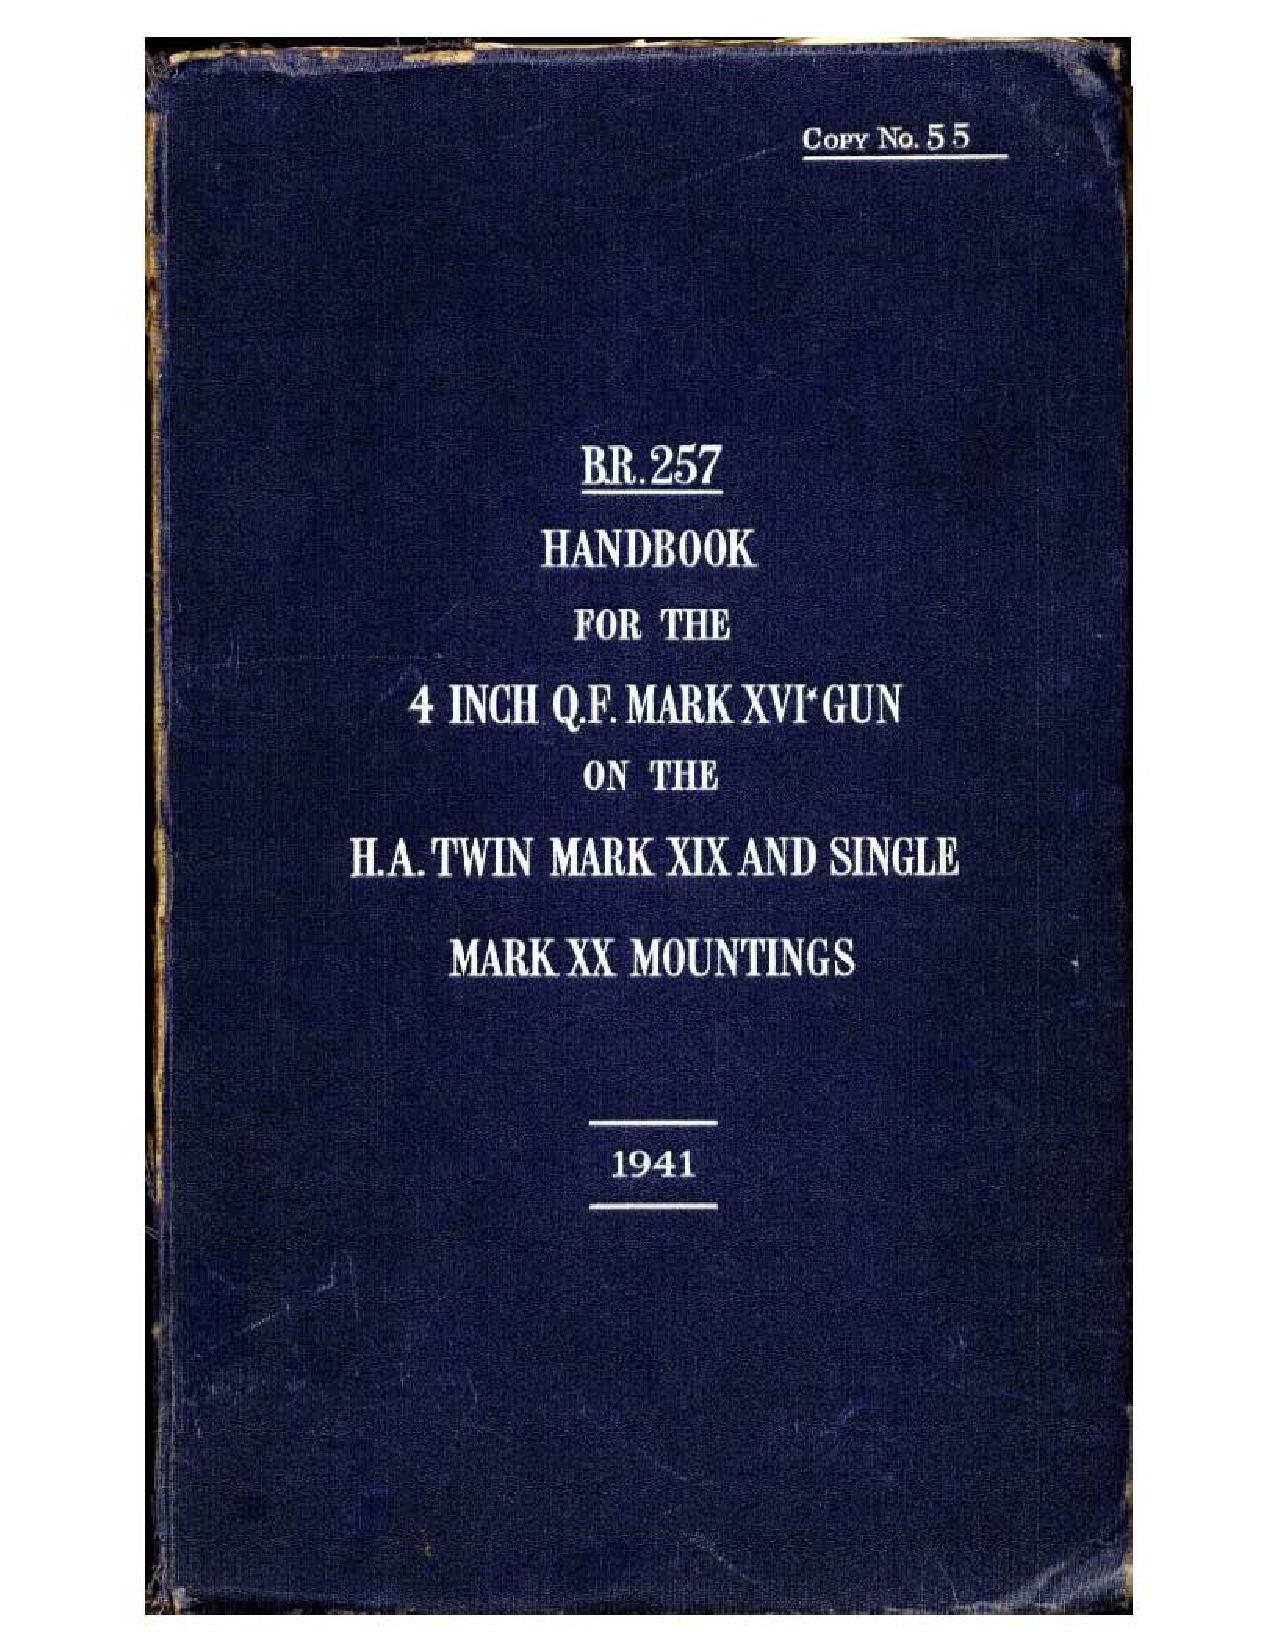 4-inch-gun-handbook_001